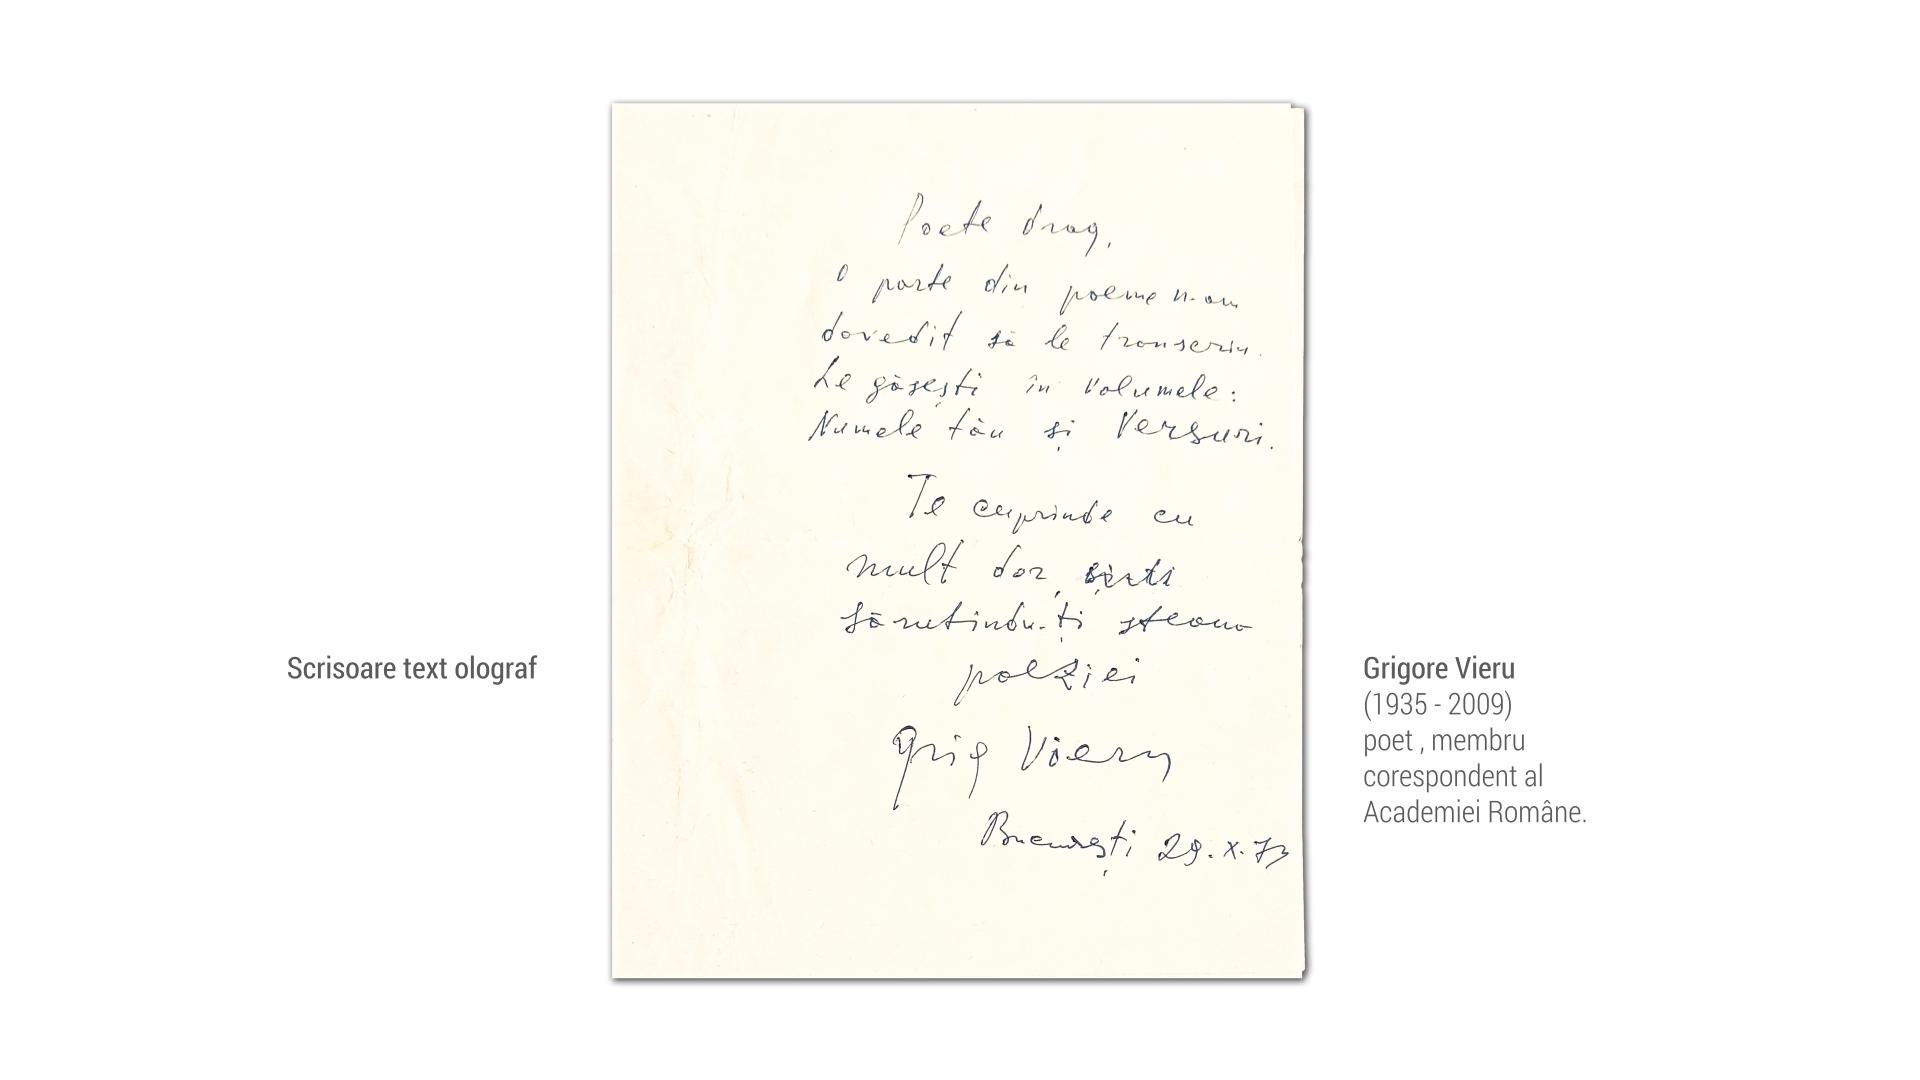 1935 Grigore Vieru - scrisoare